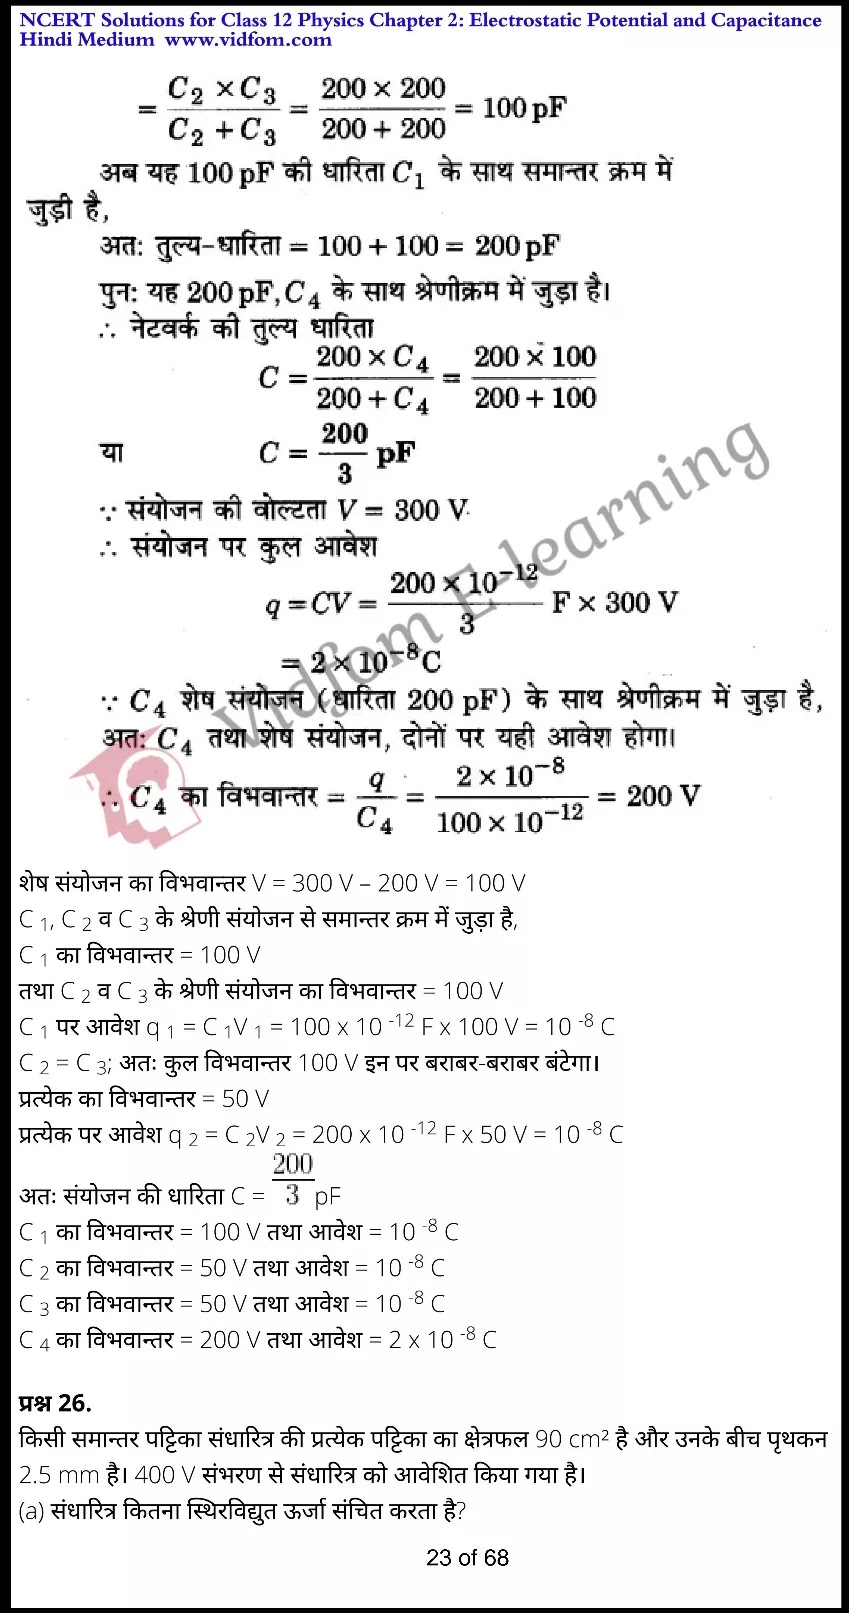 class 12 physics chapter 2 light hindi medium 23